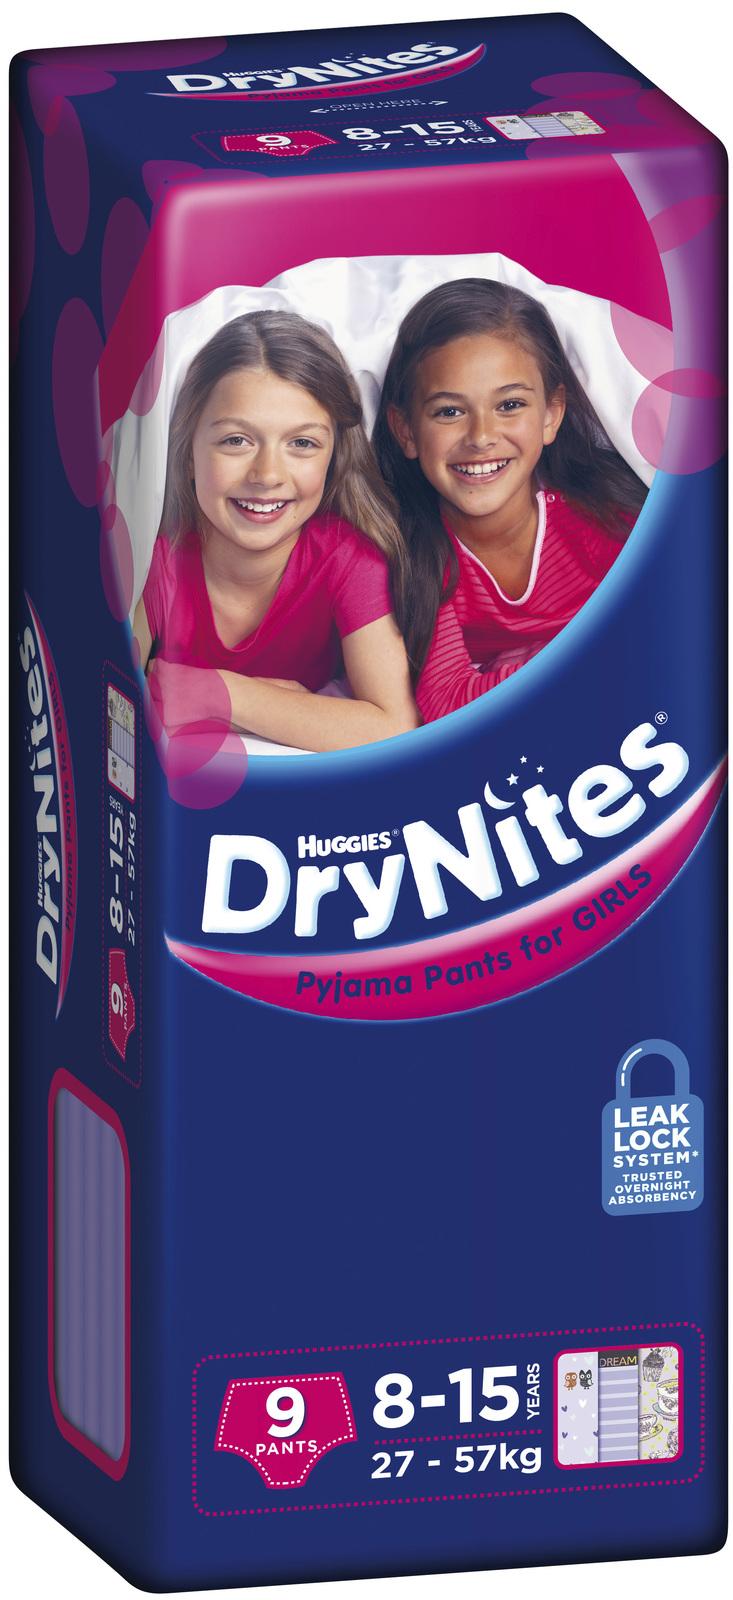 Drynites pyjama pants 8 15 year girl 27 57kg 9 at mighty ape nz